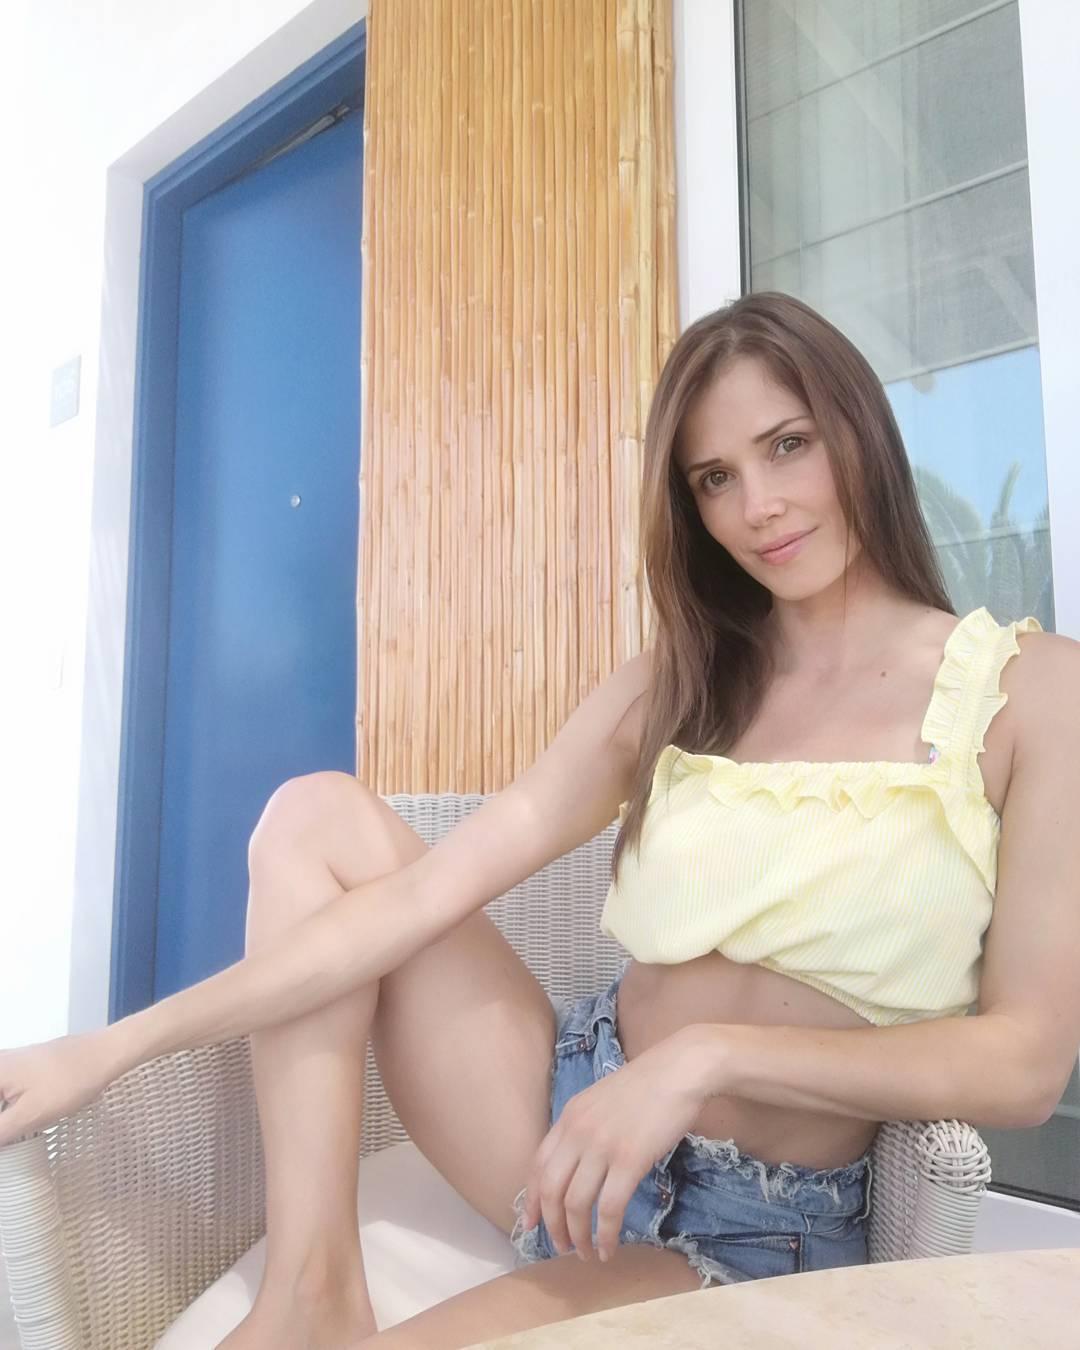 maria julia mantilla garcia (aka maju mantilla), miss world 2004. - Página 9 27879111